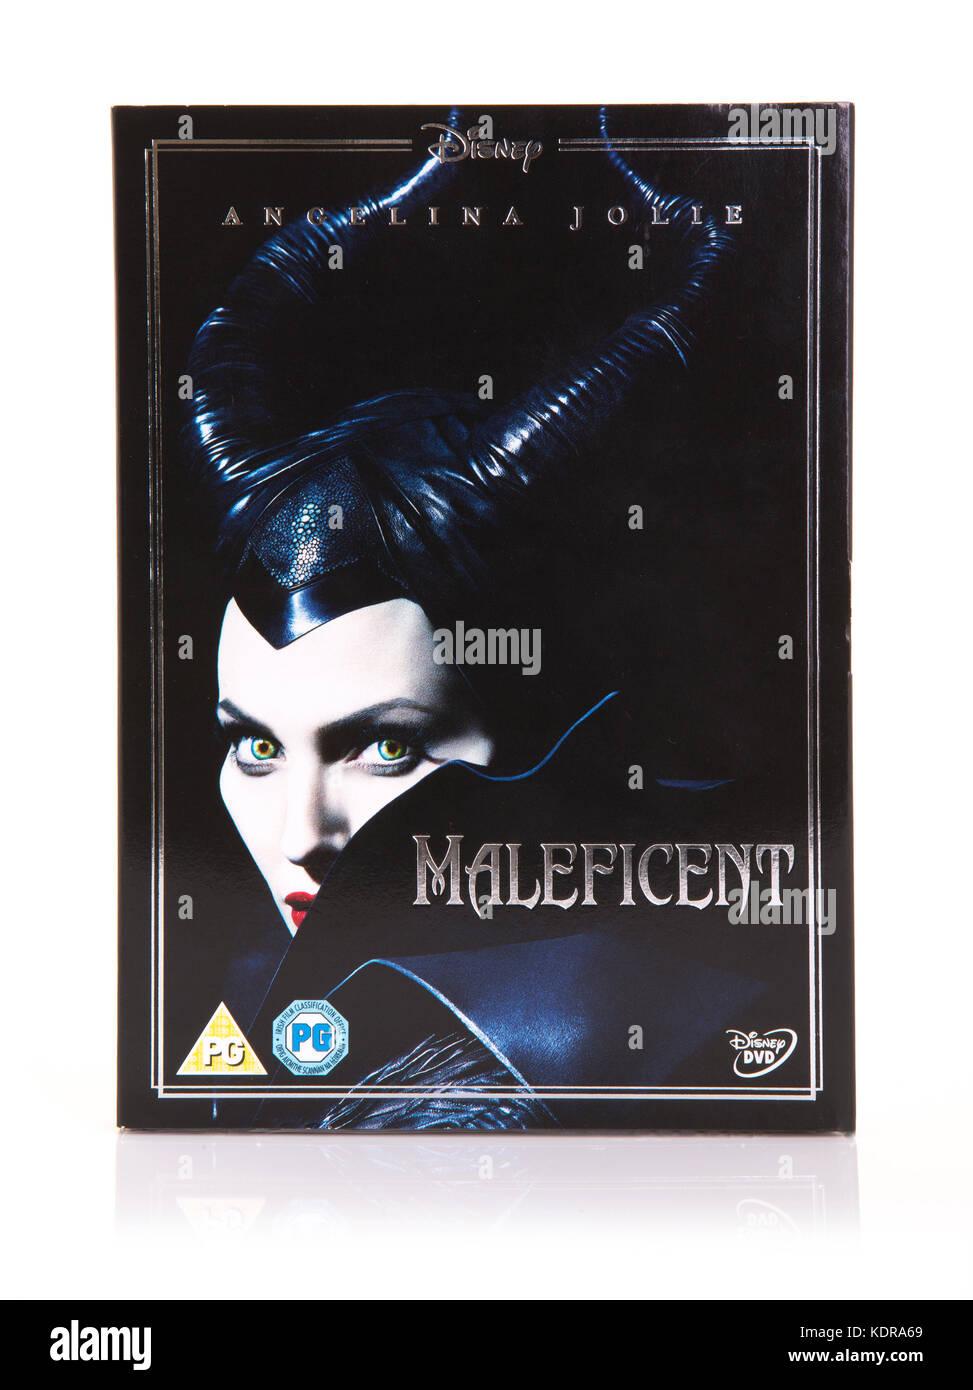 SWINDON, UK - OCTOBER 1, 2017: Maleficent  DVD with Angelina Jolie - Stock Image